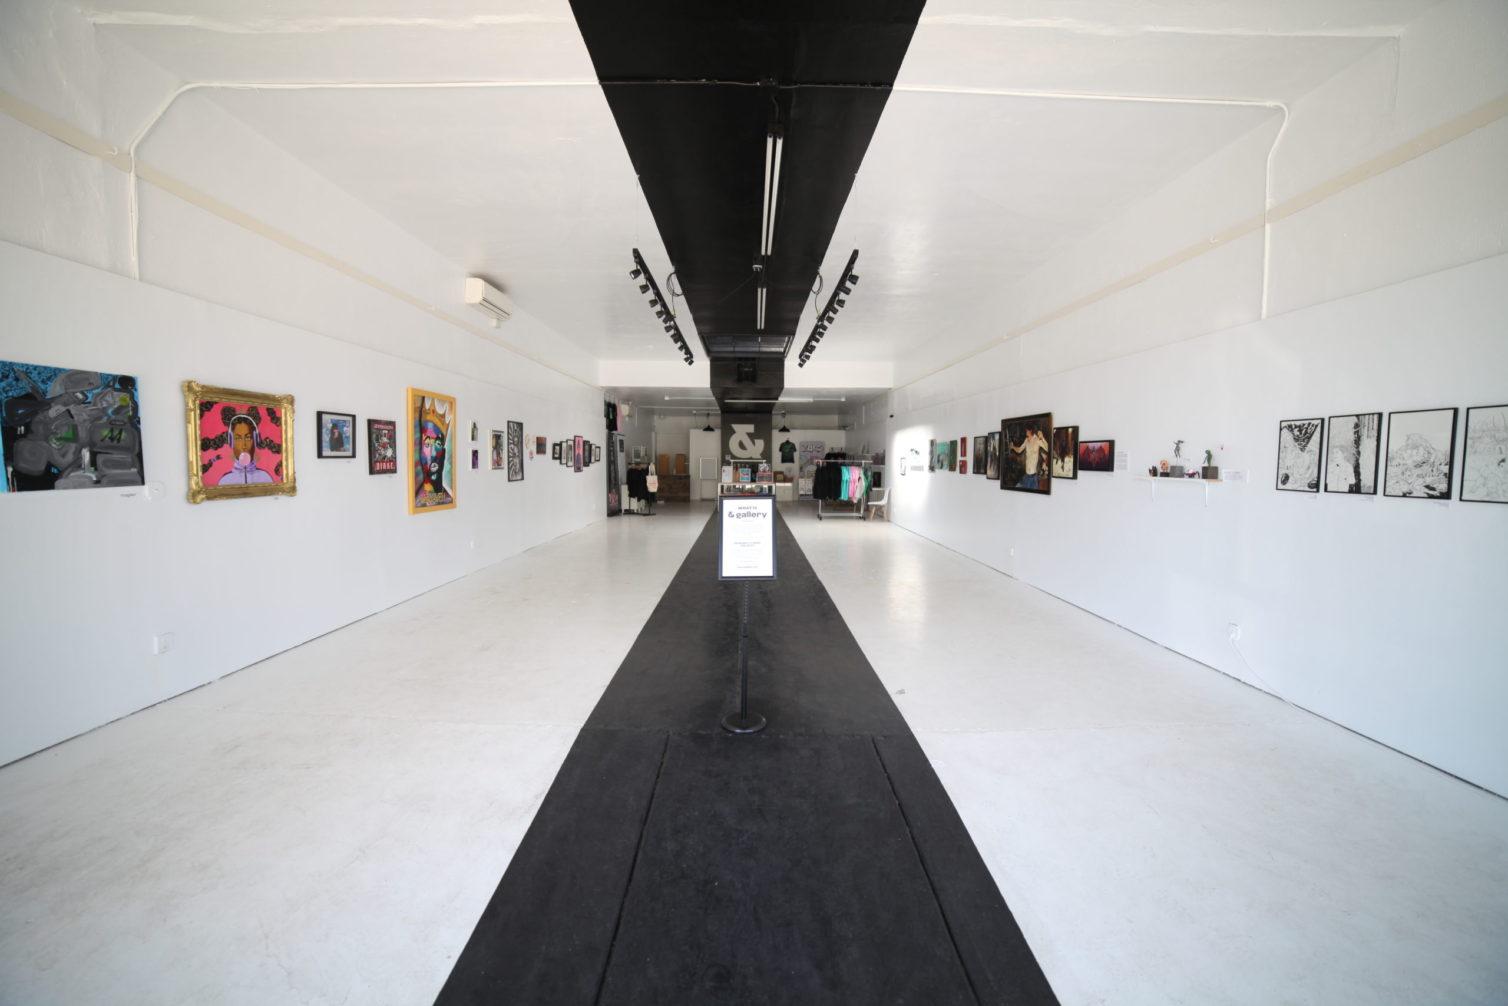 Eat Sleep Work Design Studio & Gallery, Historic 4th Ave, Tucson, AZ